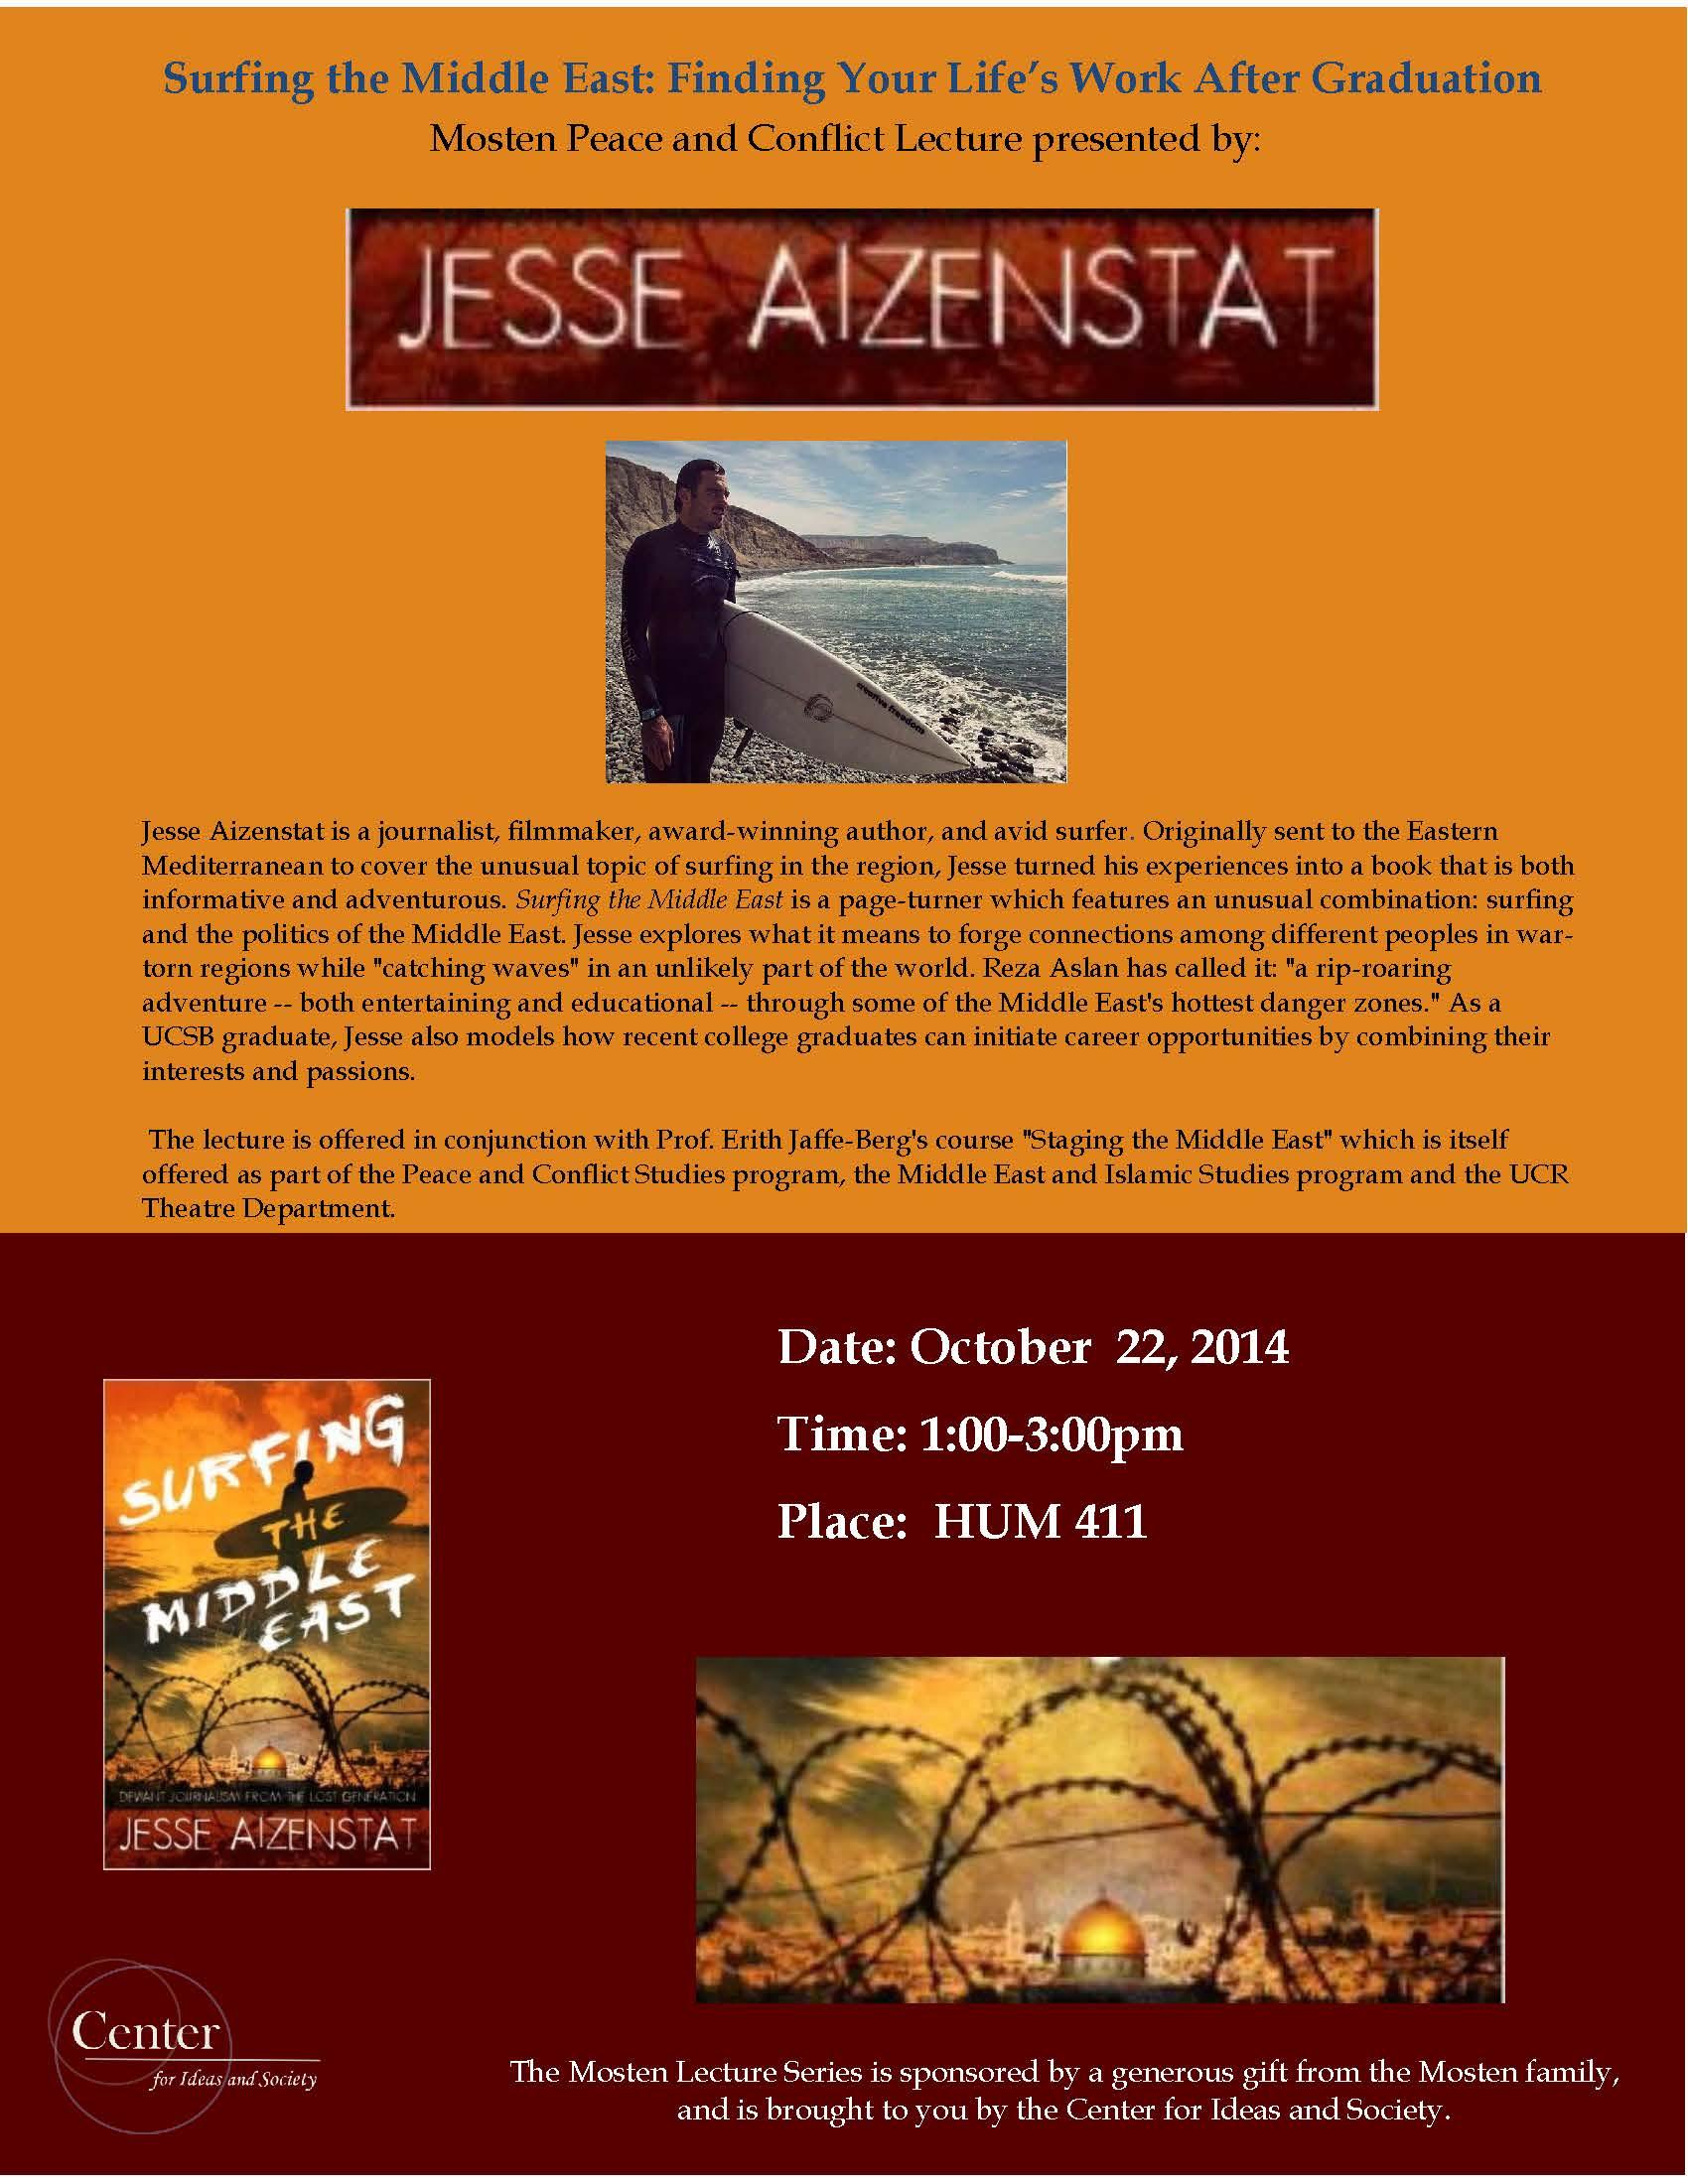 Jesse Aizenstat 10-22